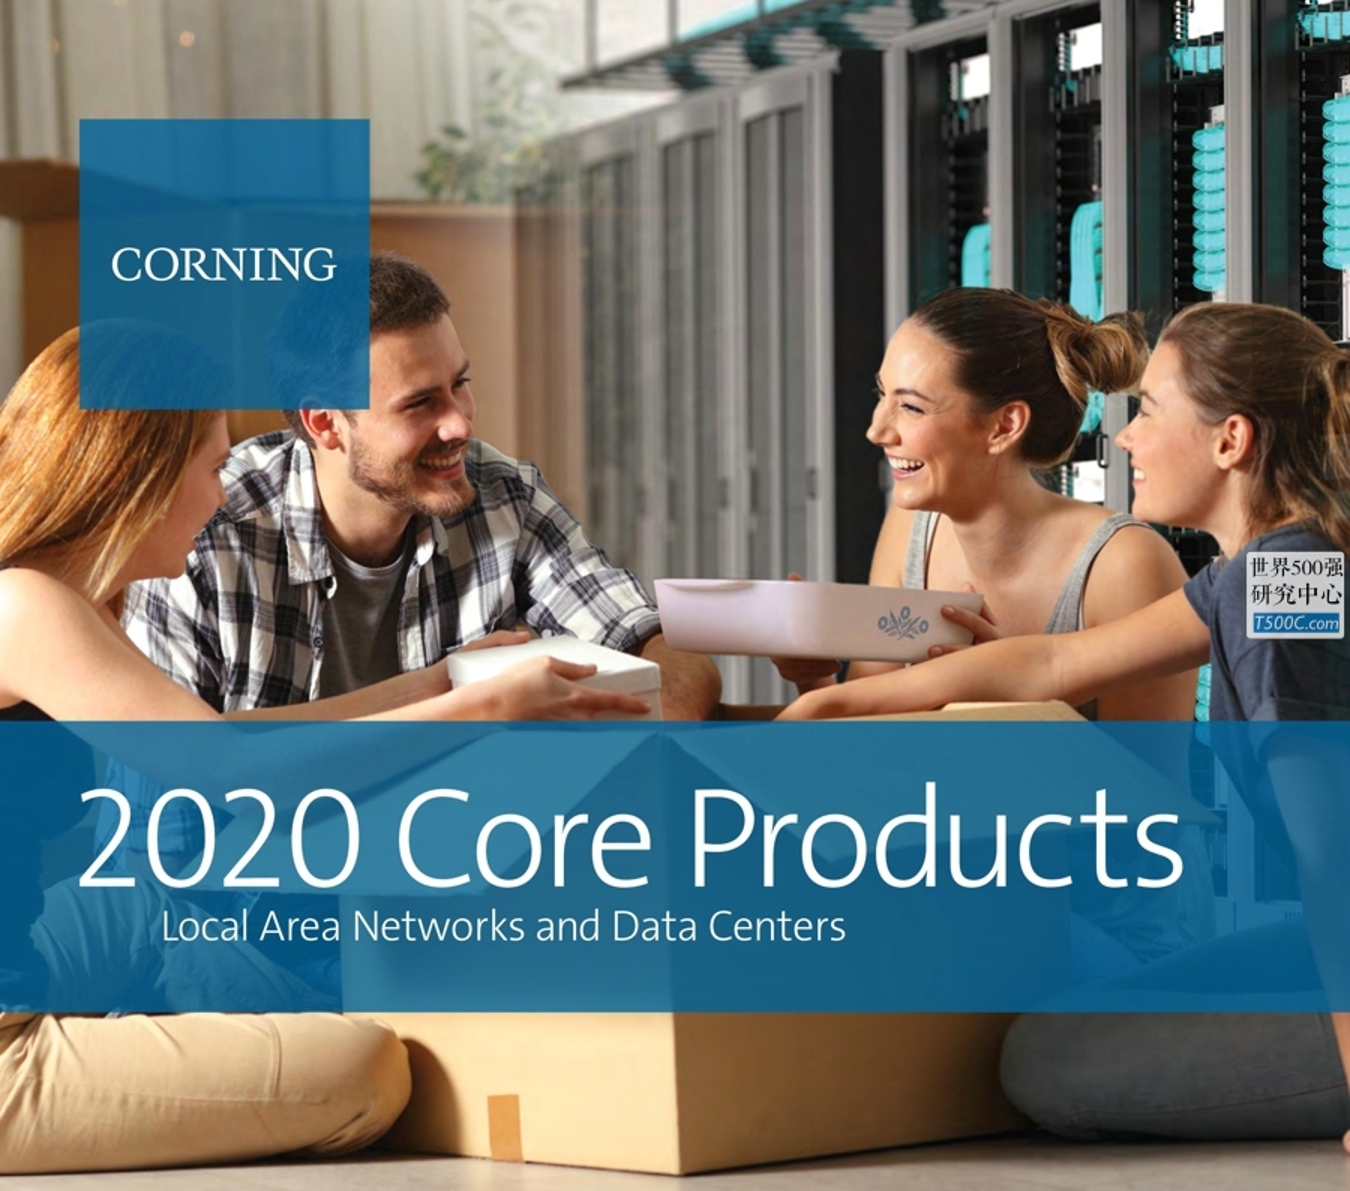 康宁玻璃Corning_产品宣传册Brochure_T500C.com_2020 core products